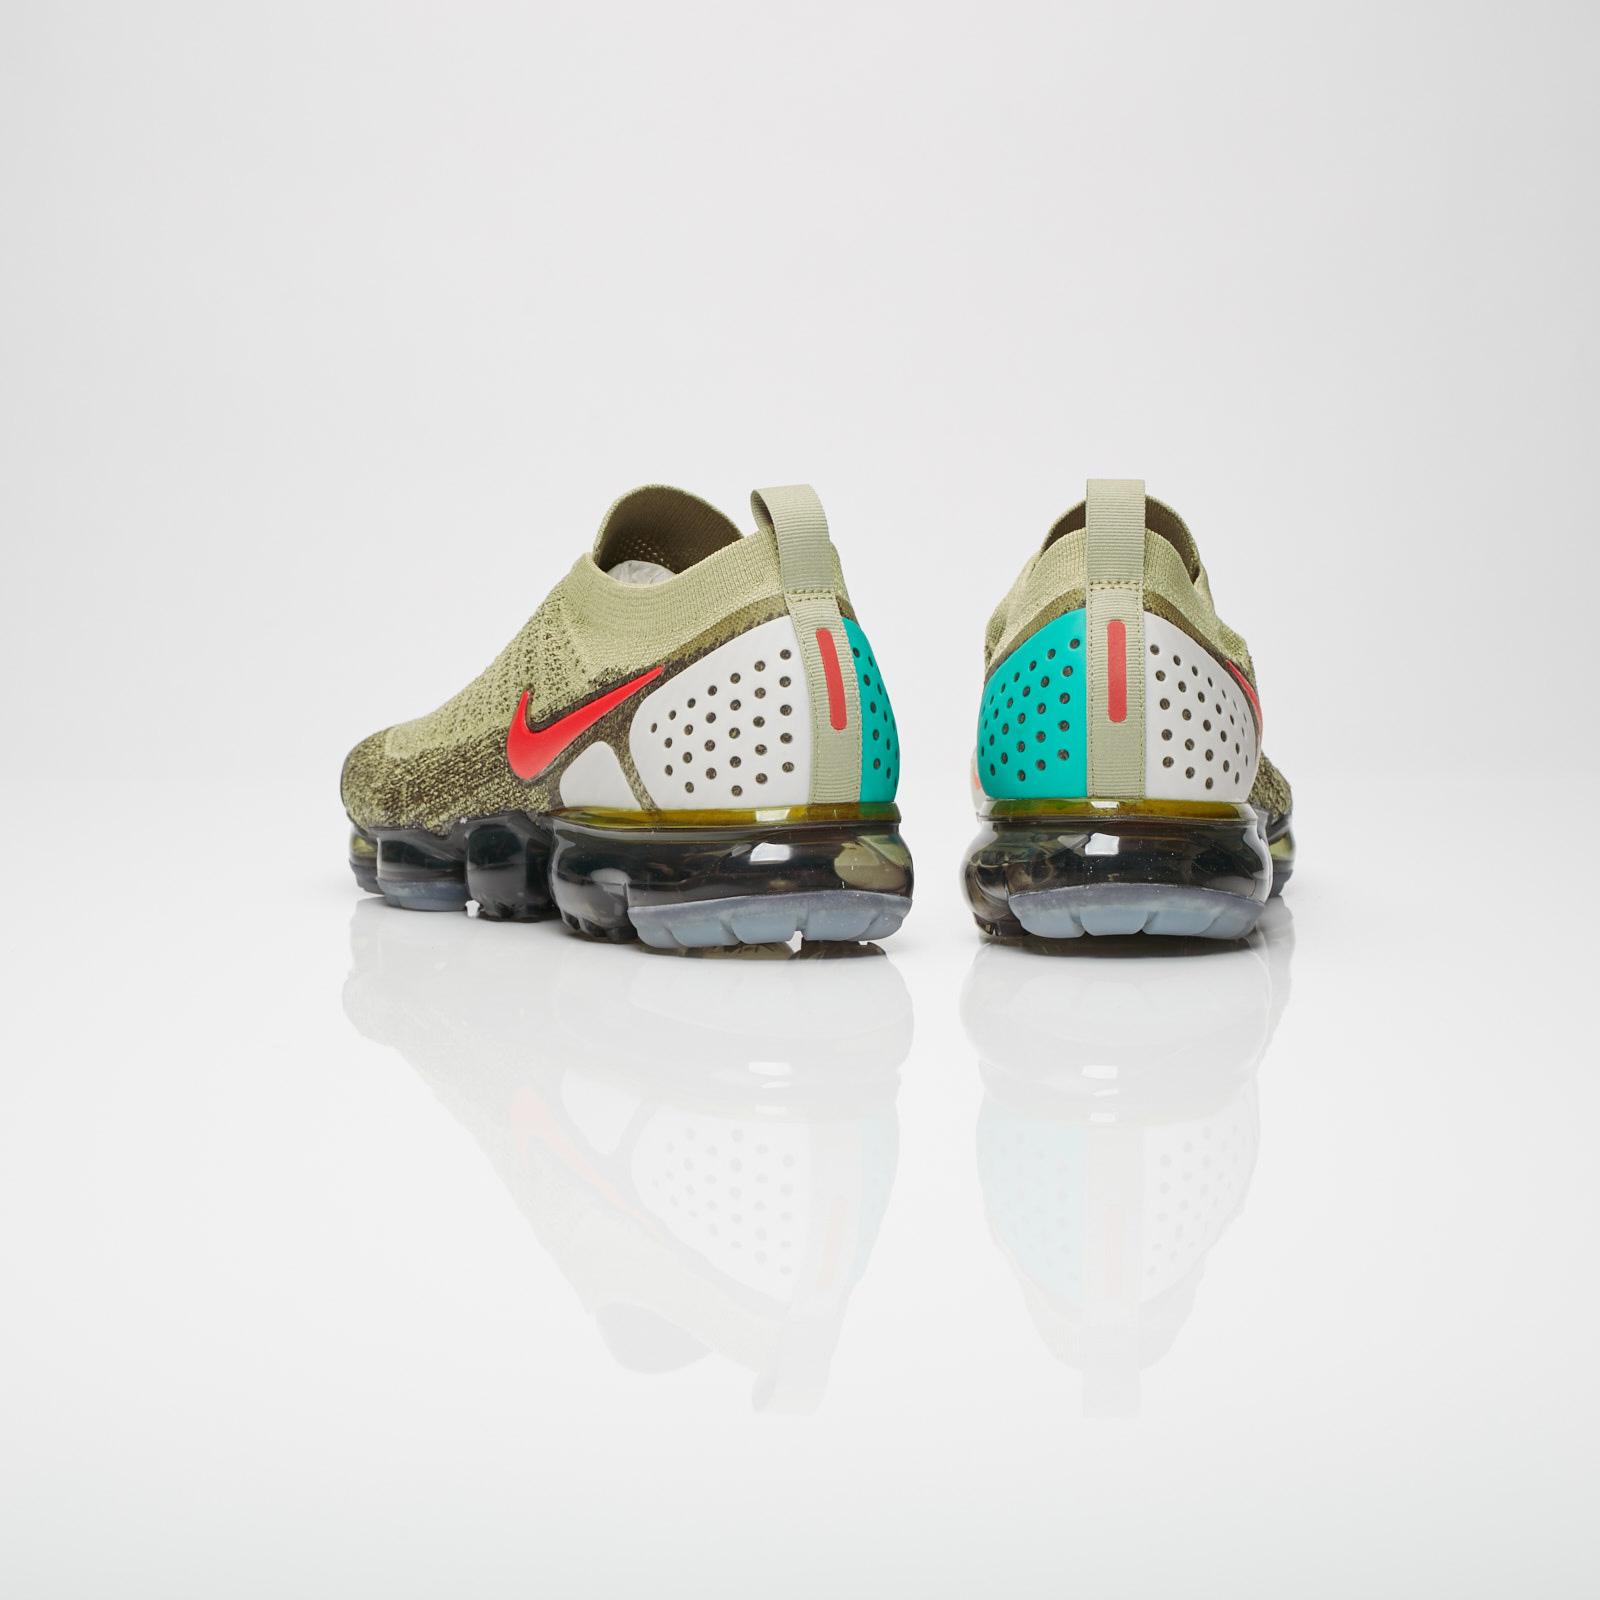 02681c7758ebb Nike Air Vapormax FK Moc 2 - Ah7006-200 - Sneakersnstuff